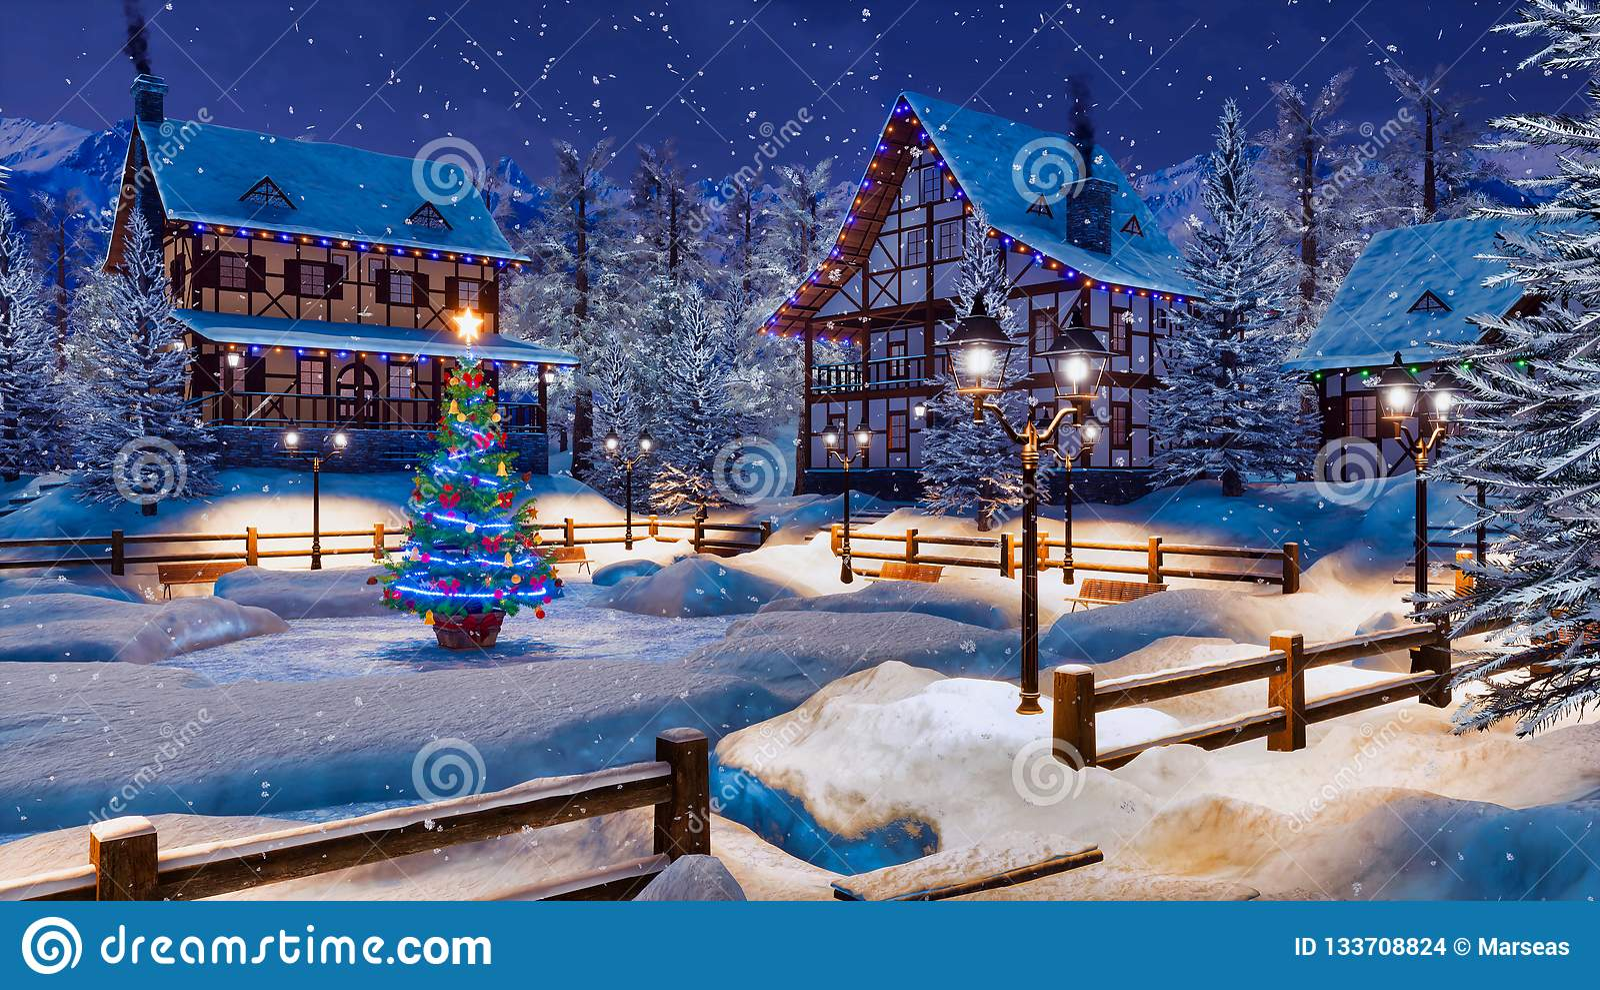 Christmas Mountain Village.Winter Night Before Christmas In Mountain Village Stock